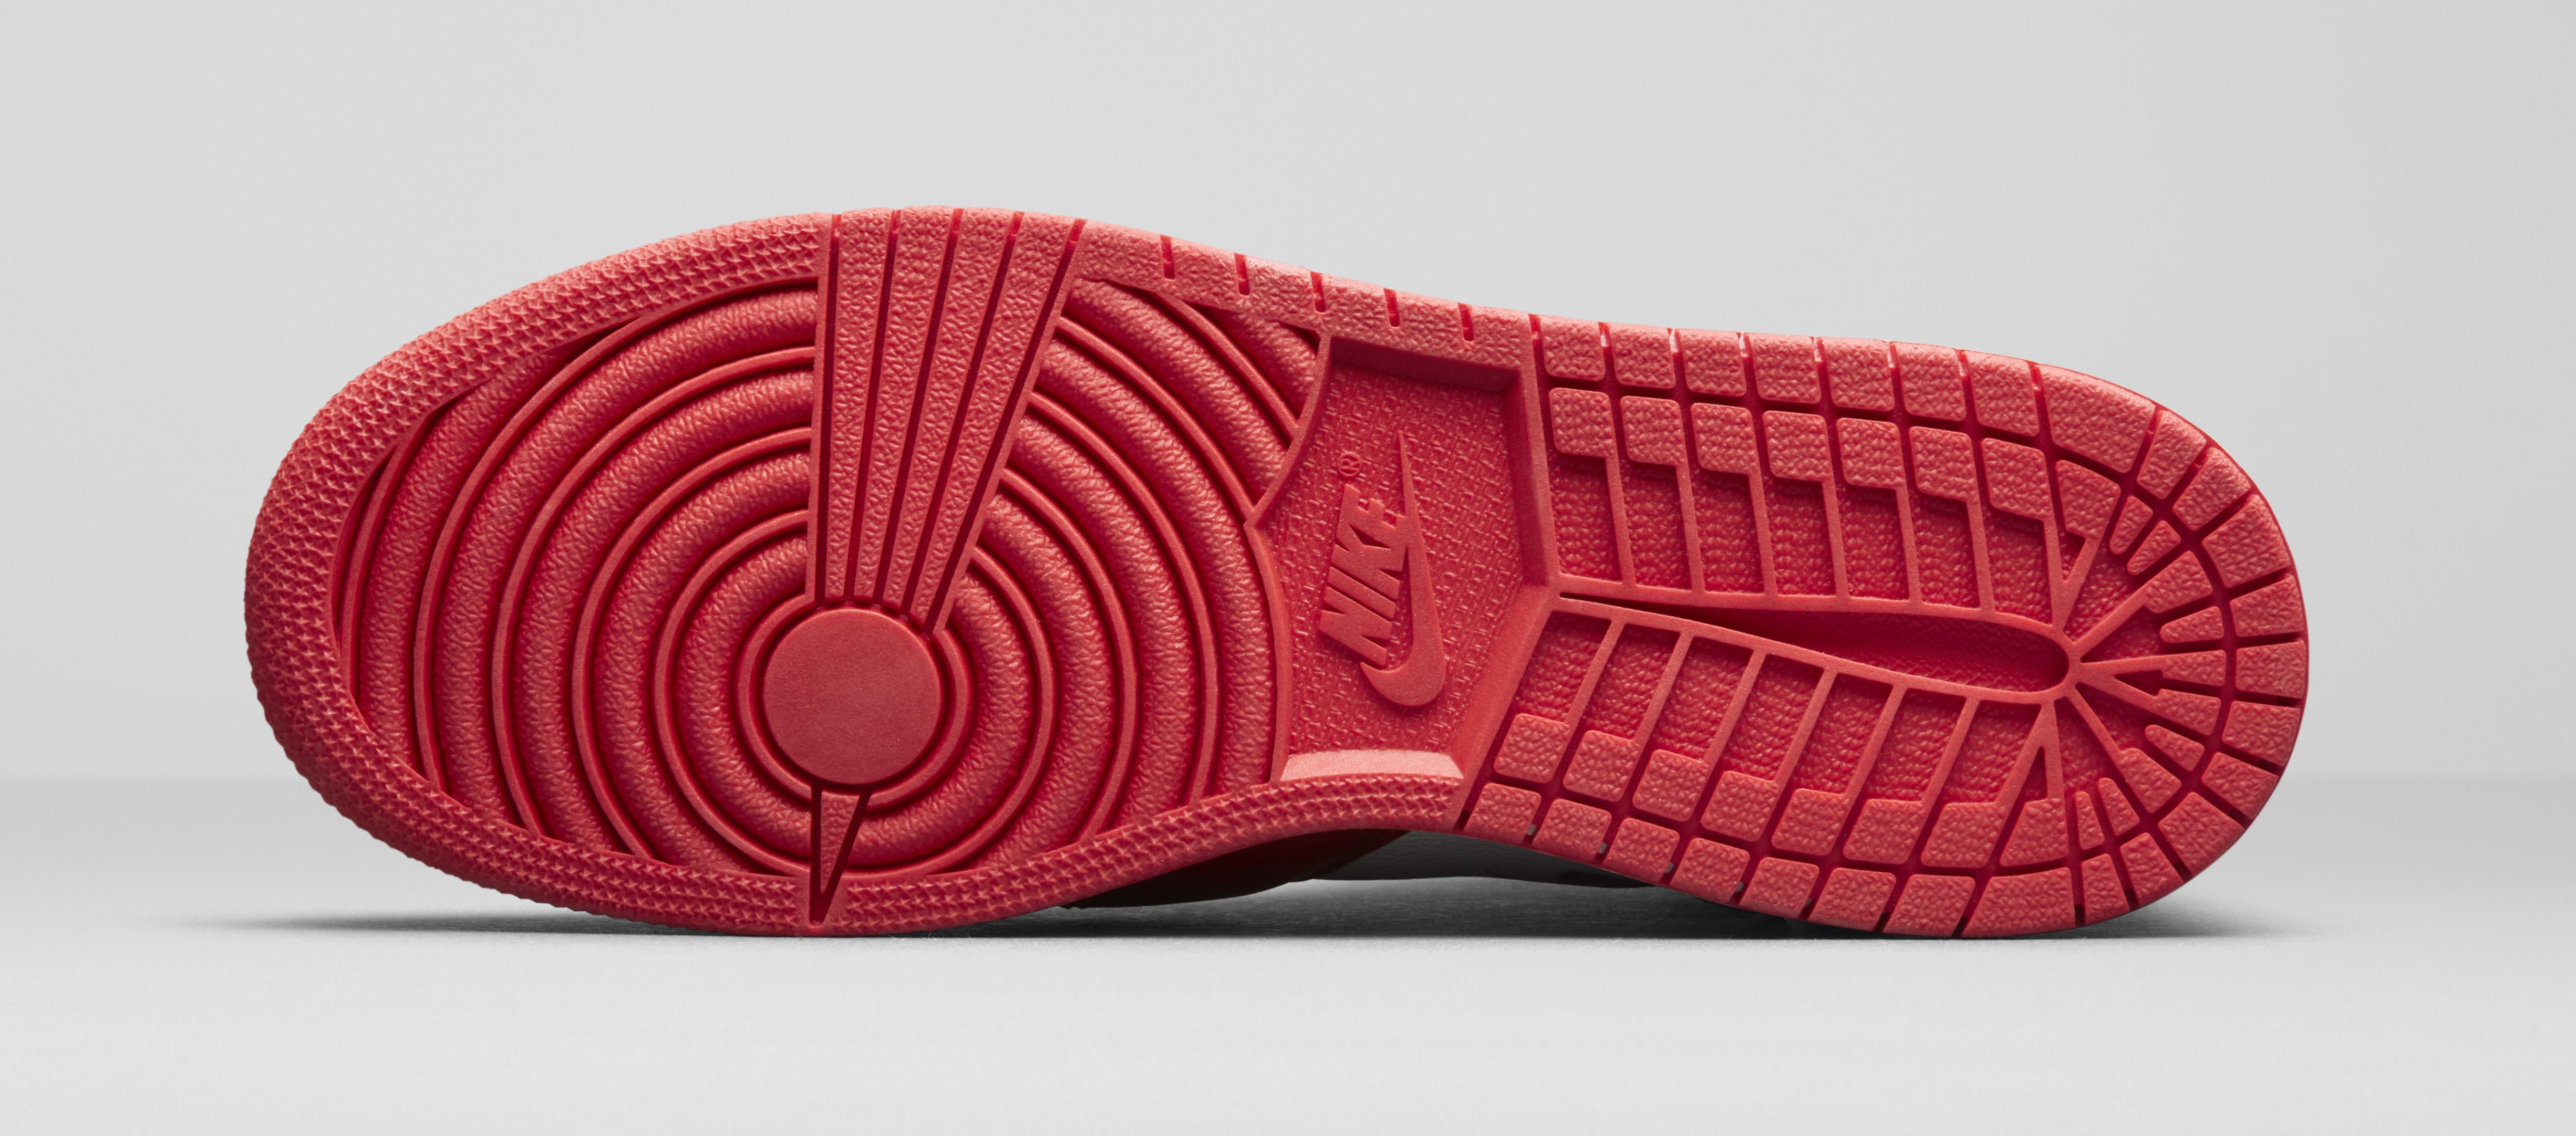 Air Jordan 1 Rebel 'Chicago' AT4151-000 (Bottom)